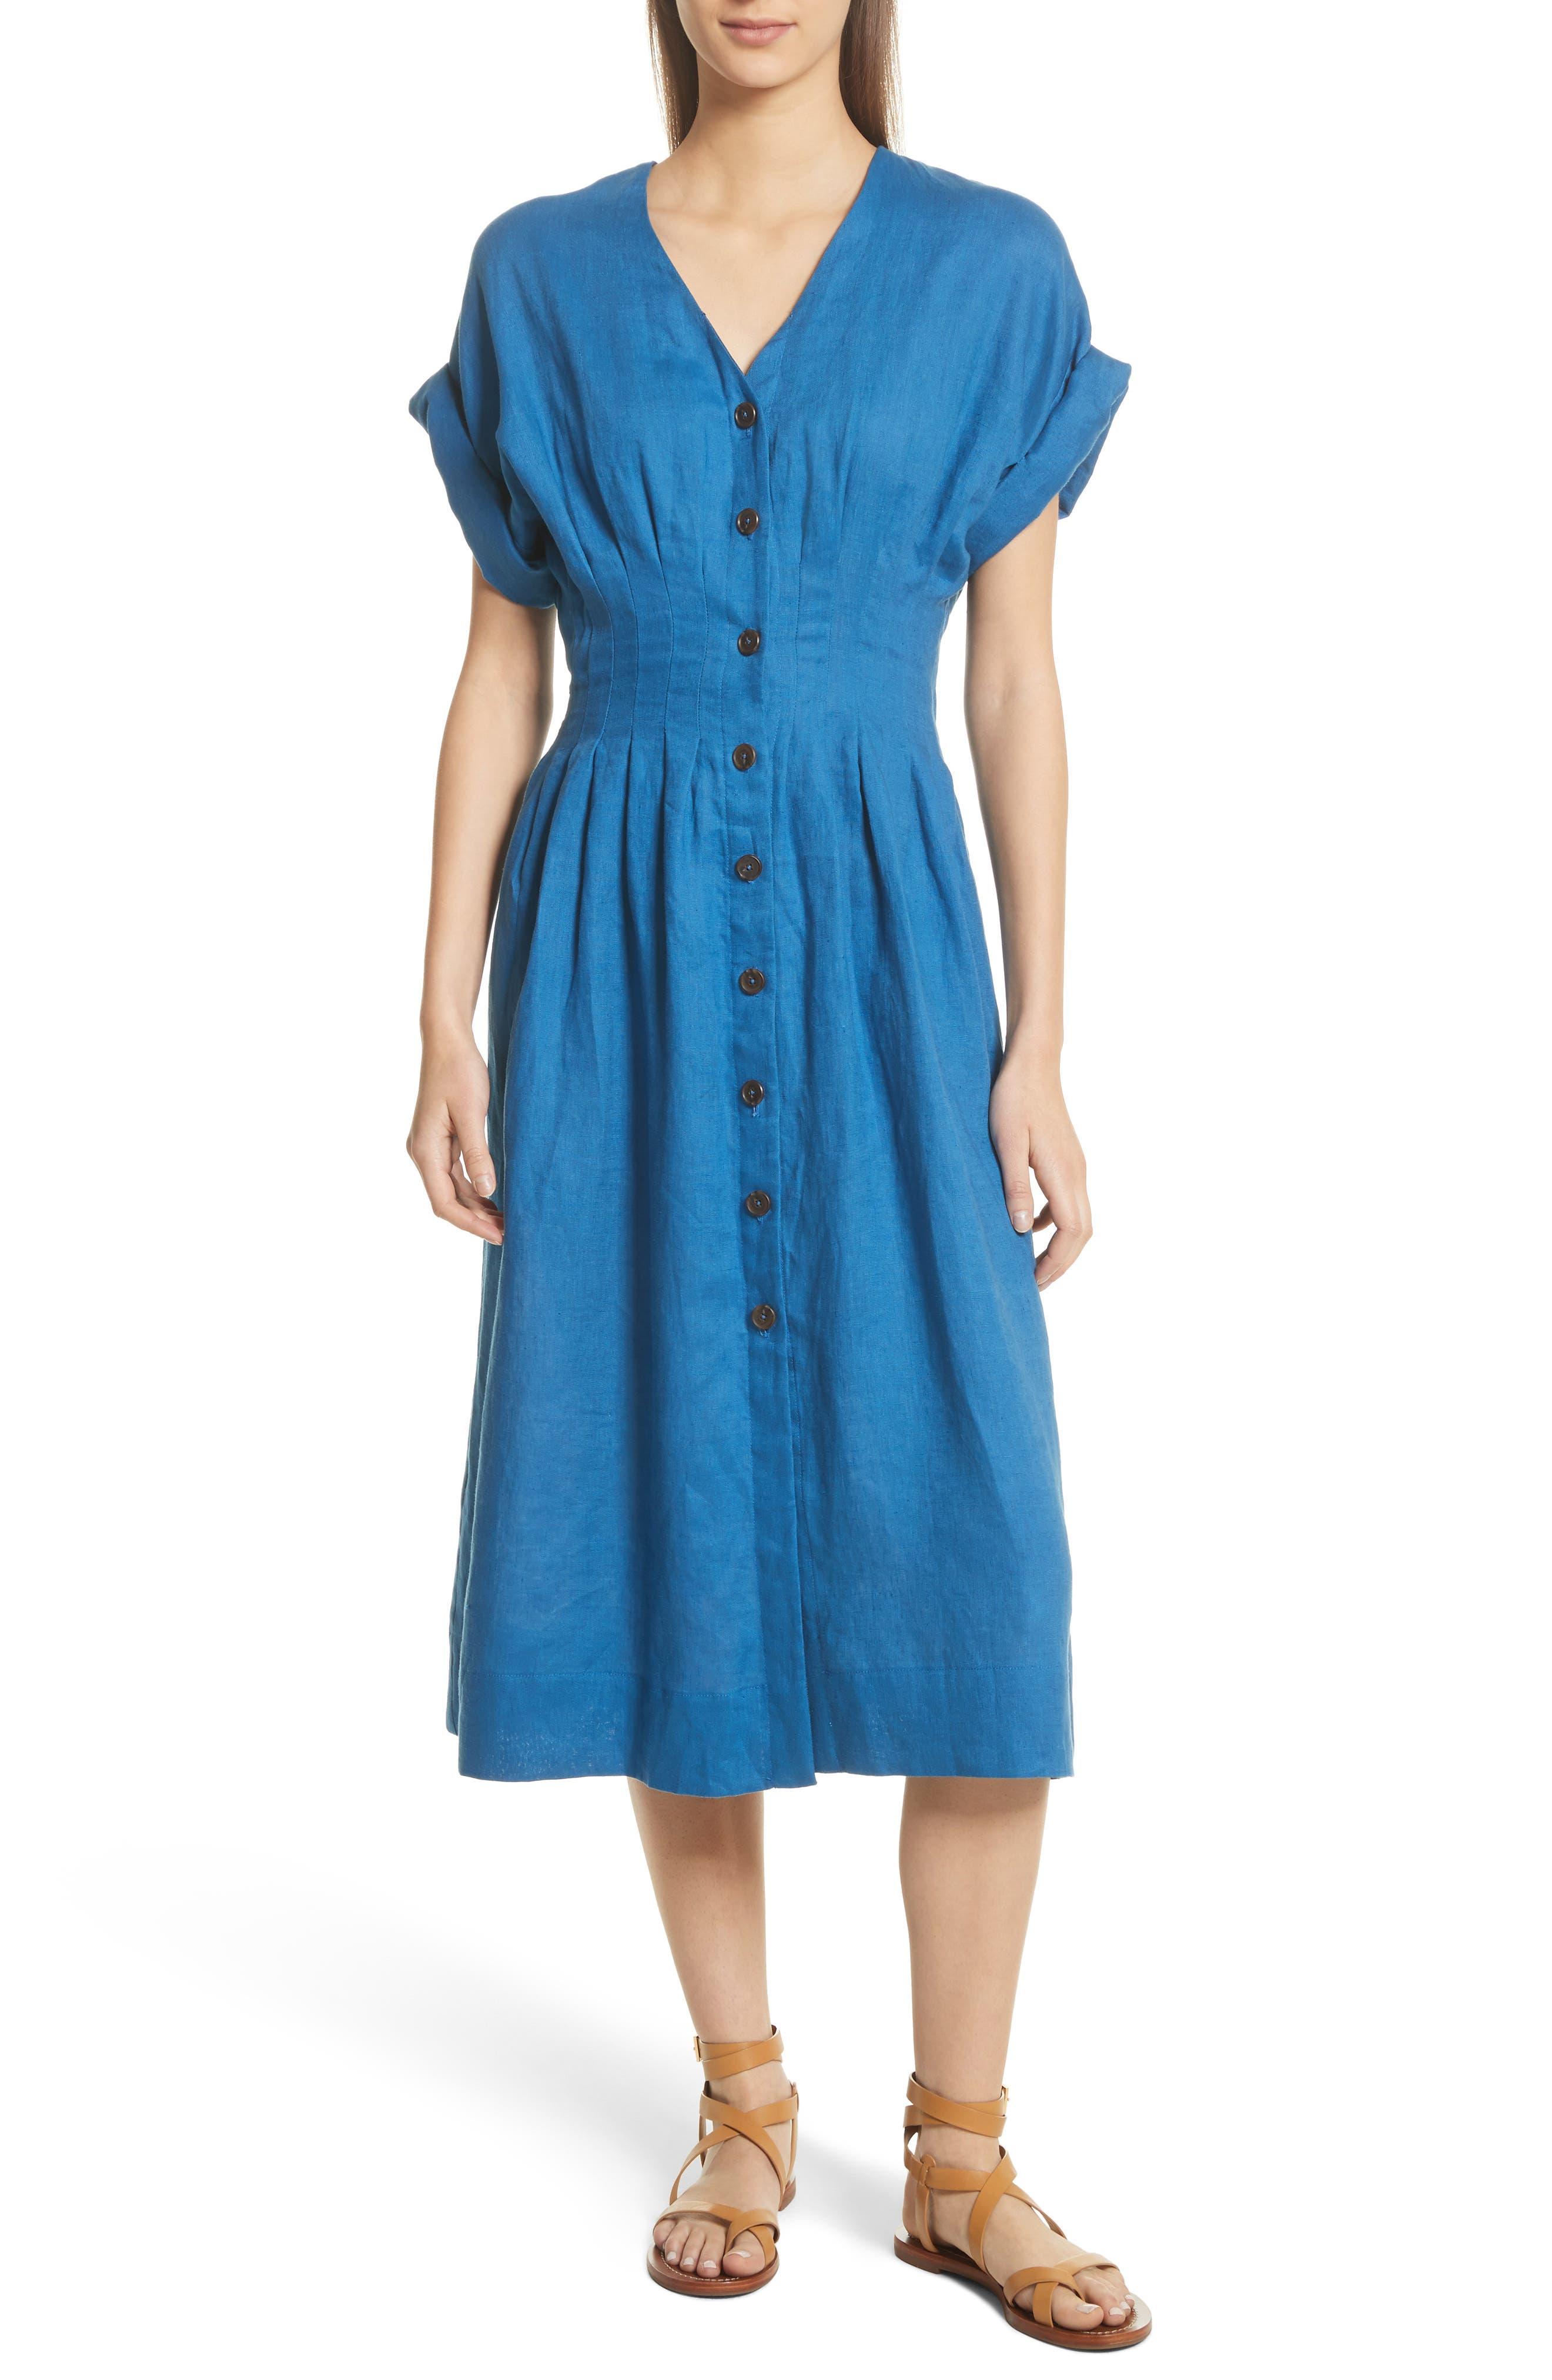 Coraline Pleated Button Front Linen Dress,                             Main thumbnail 1, color,                             400